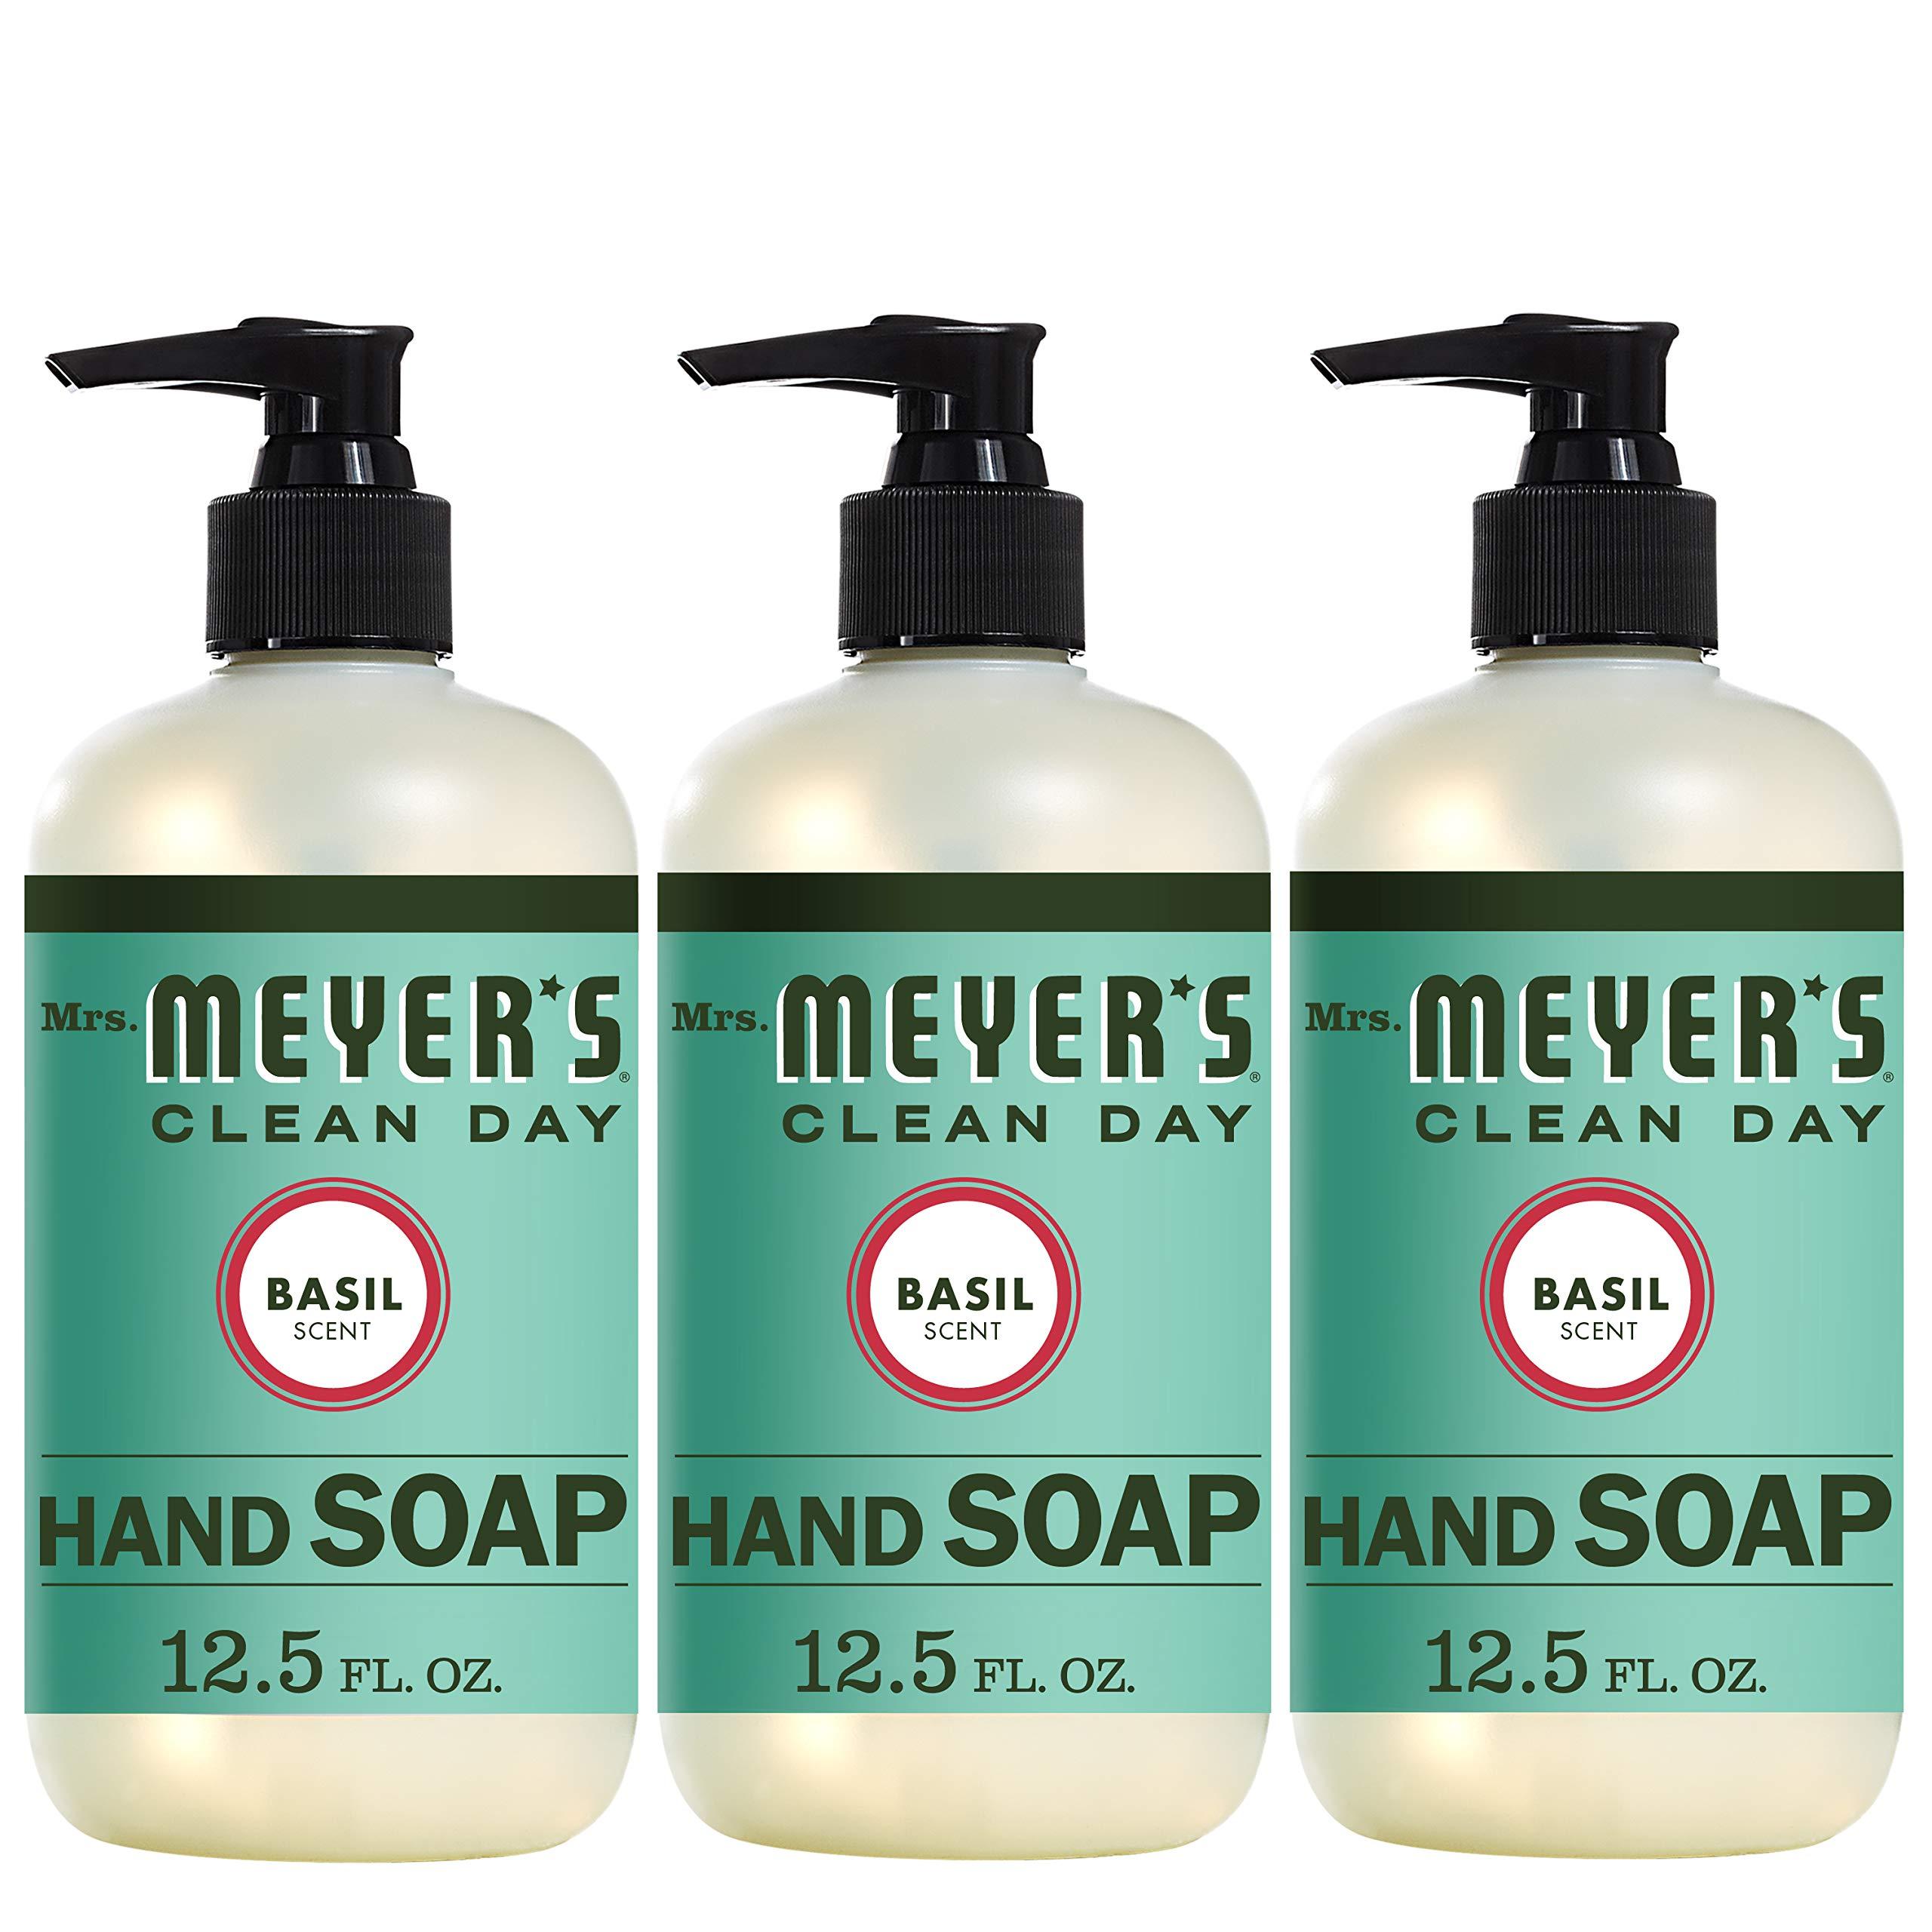 Mrs. Meyer´s Clean Day Hand Soap, Basil, 12.5 fl oz, 3 ct by Mrs. Meyer's Clean Day